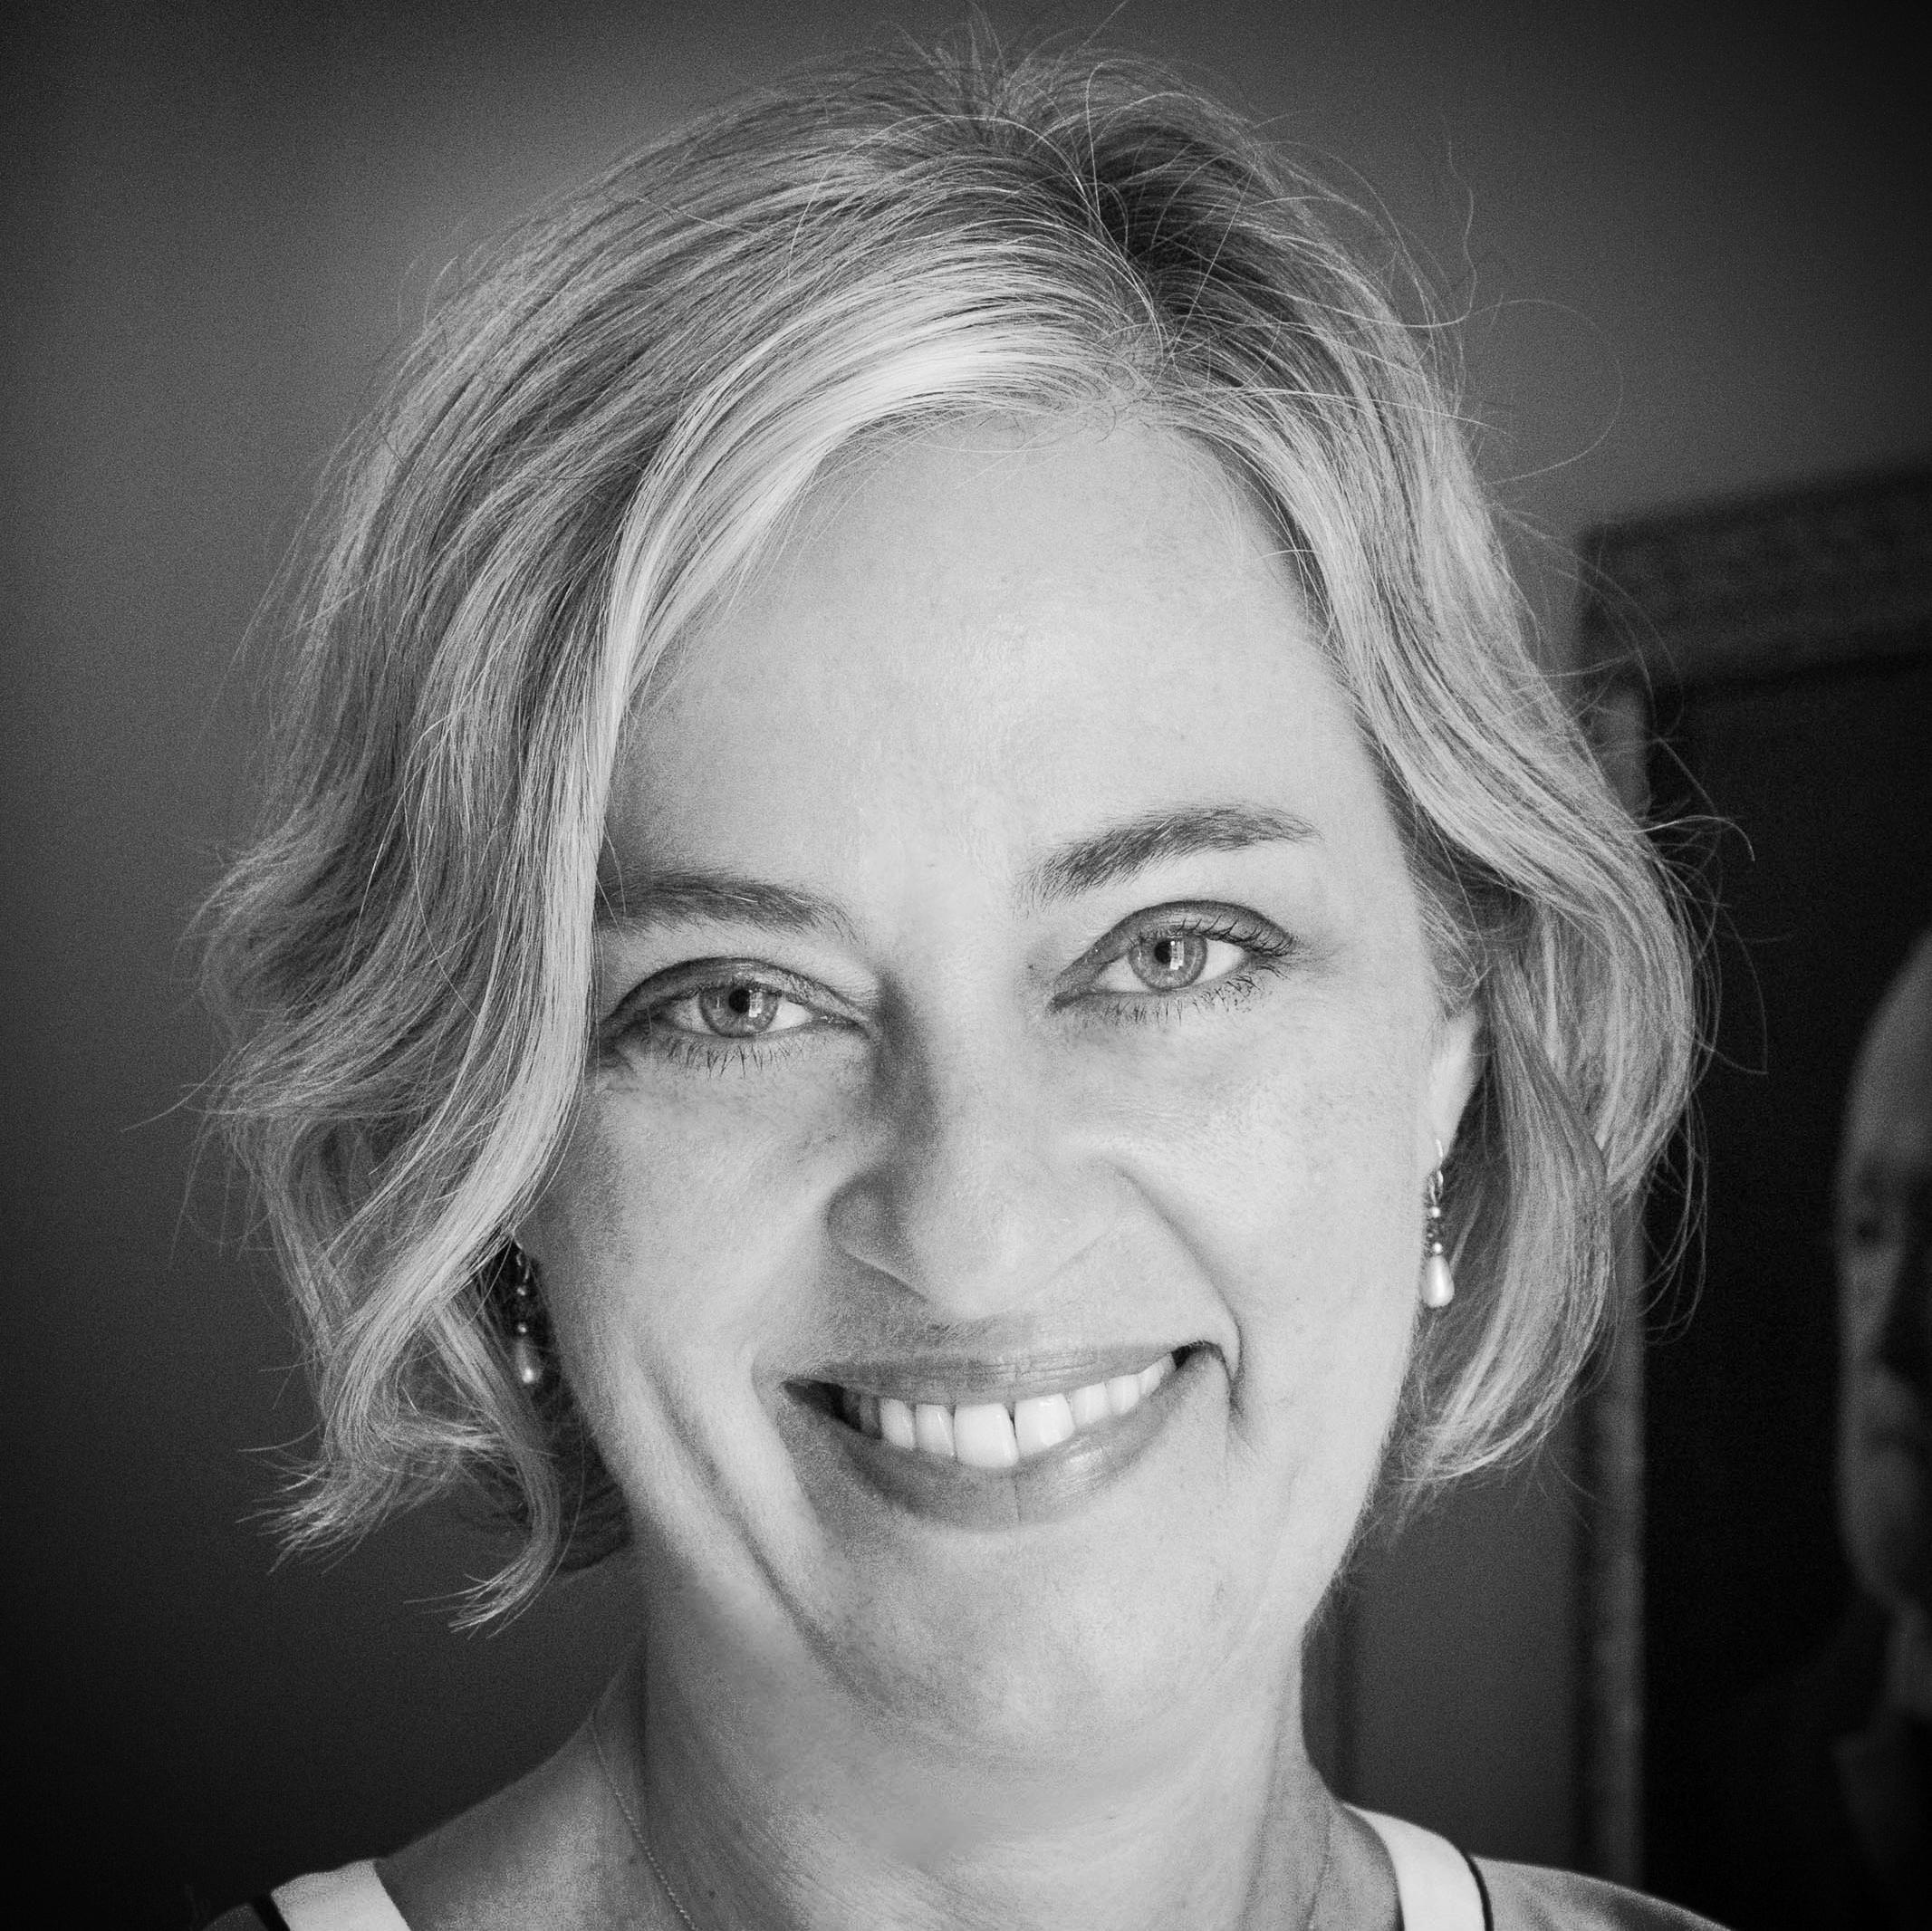 Joanna Hay, Producer/Director